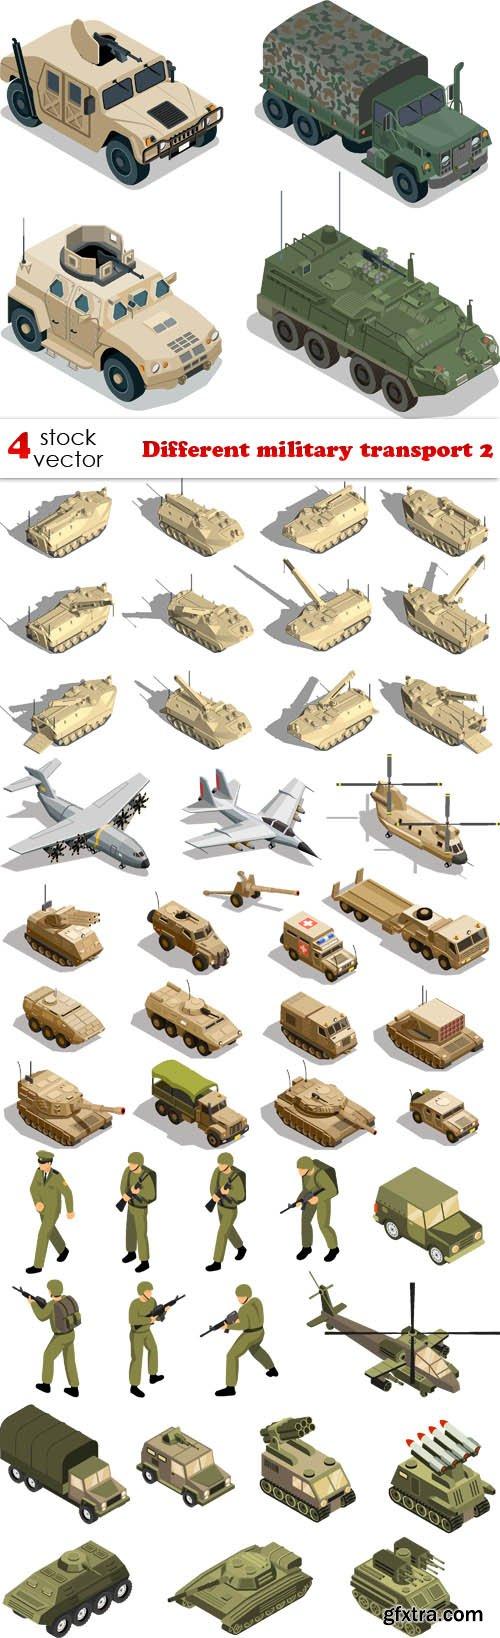 Vectors - Different military transport 2